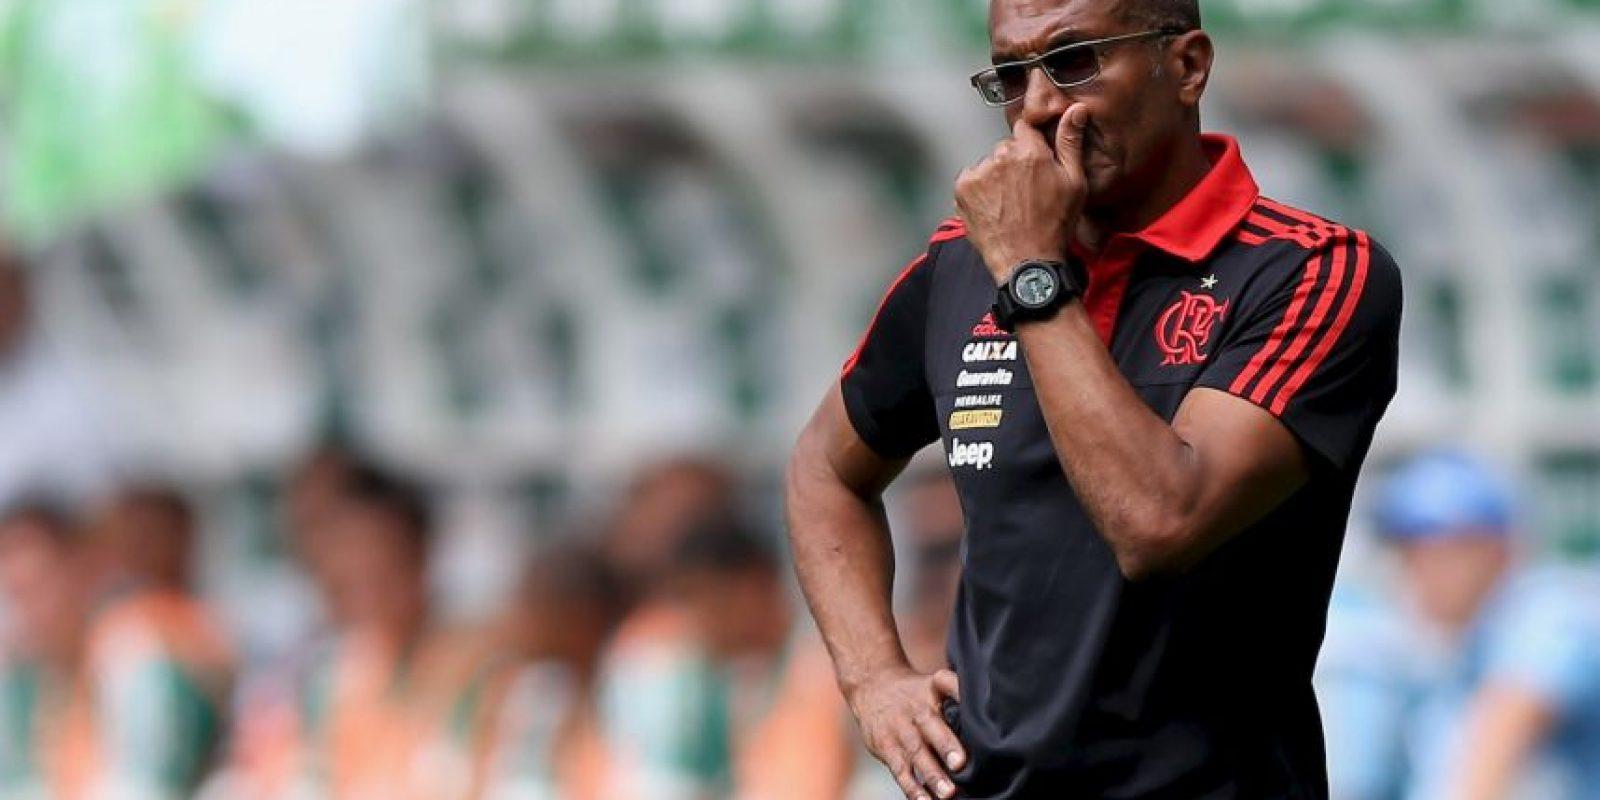 Cristovao Borges (Atlético Paranaense) Foto:Getty images